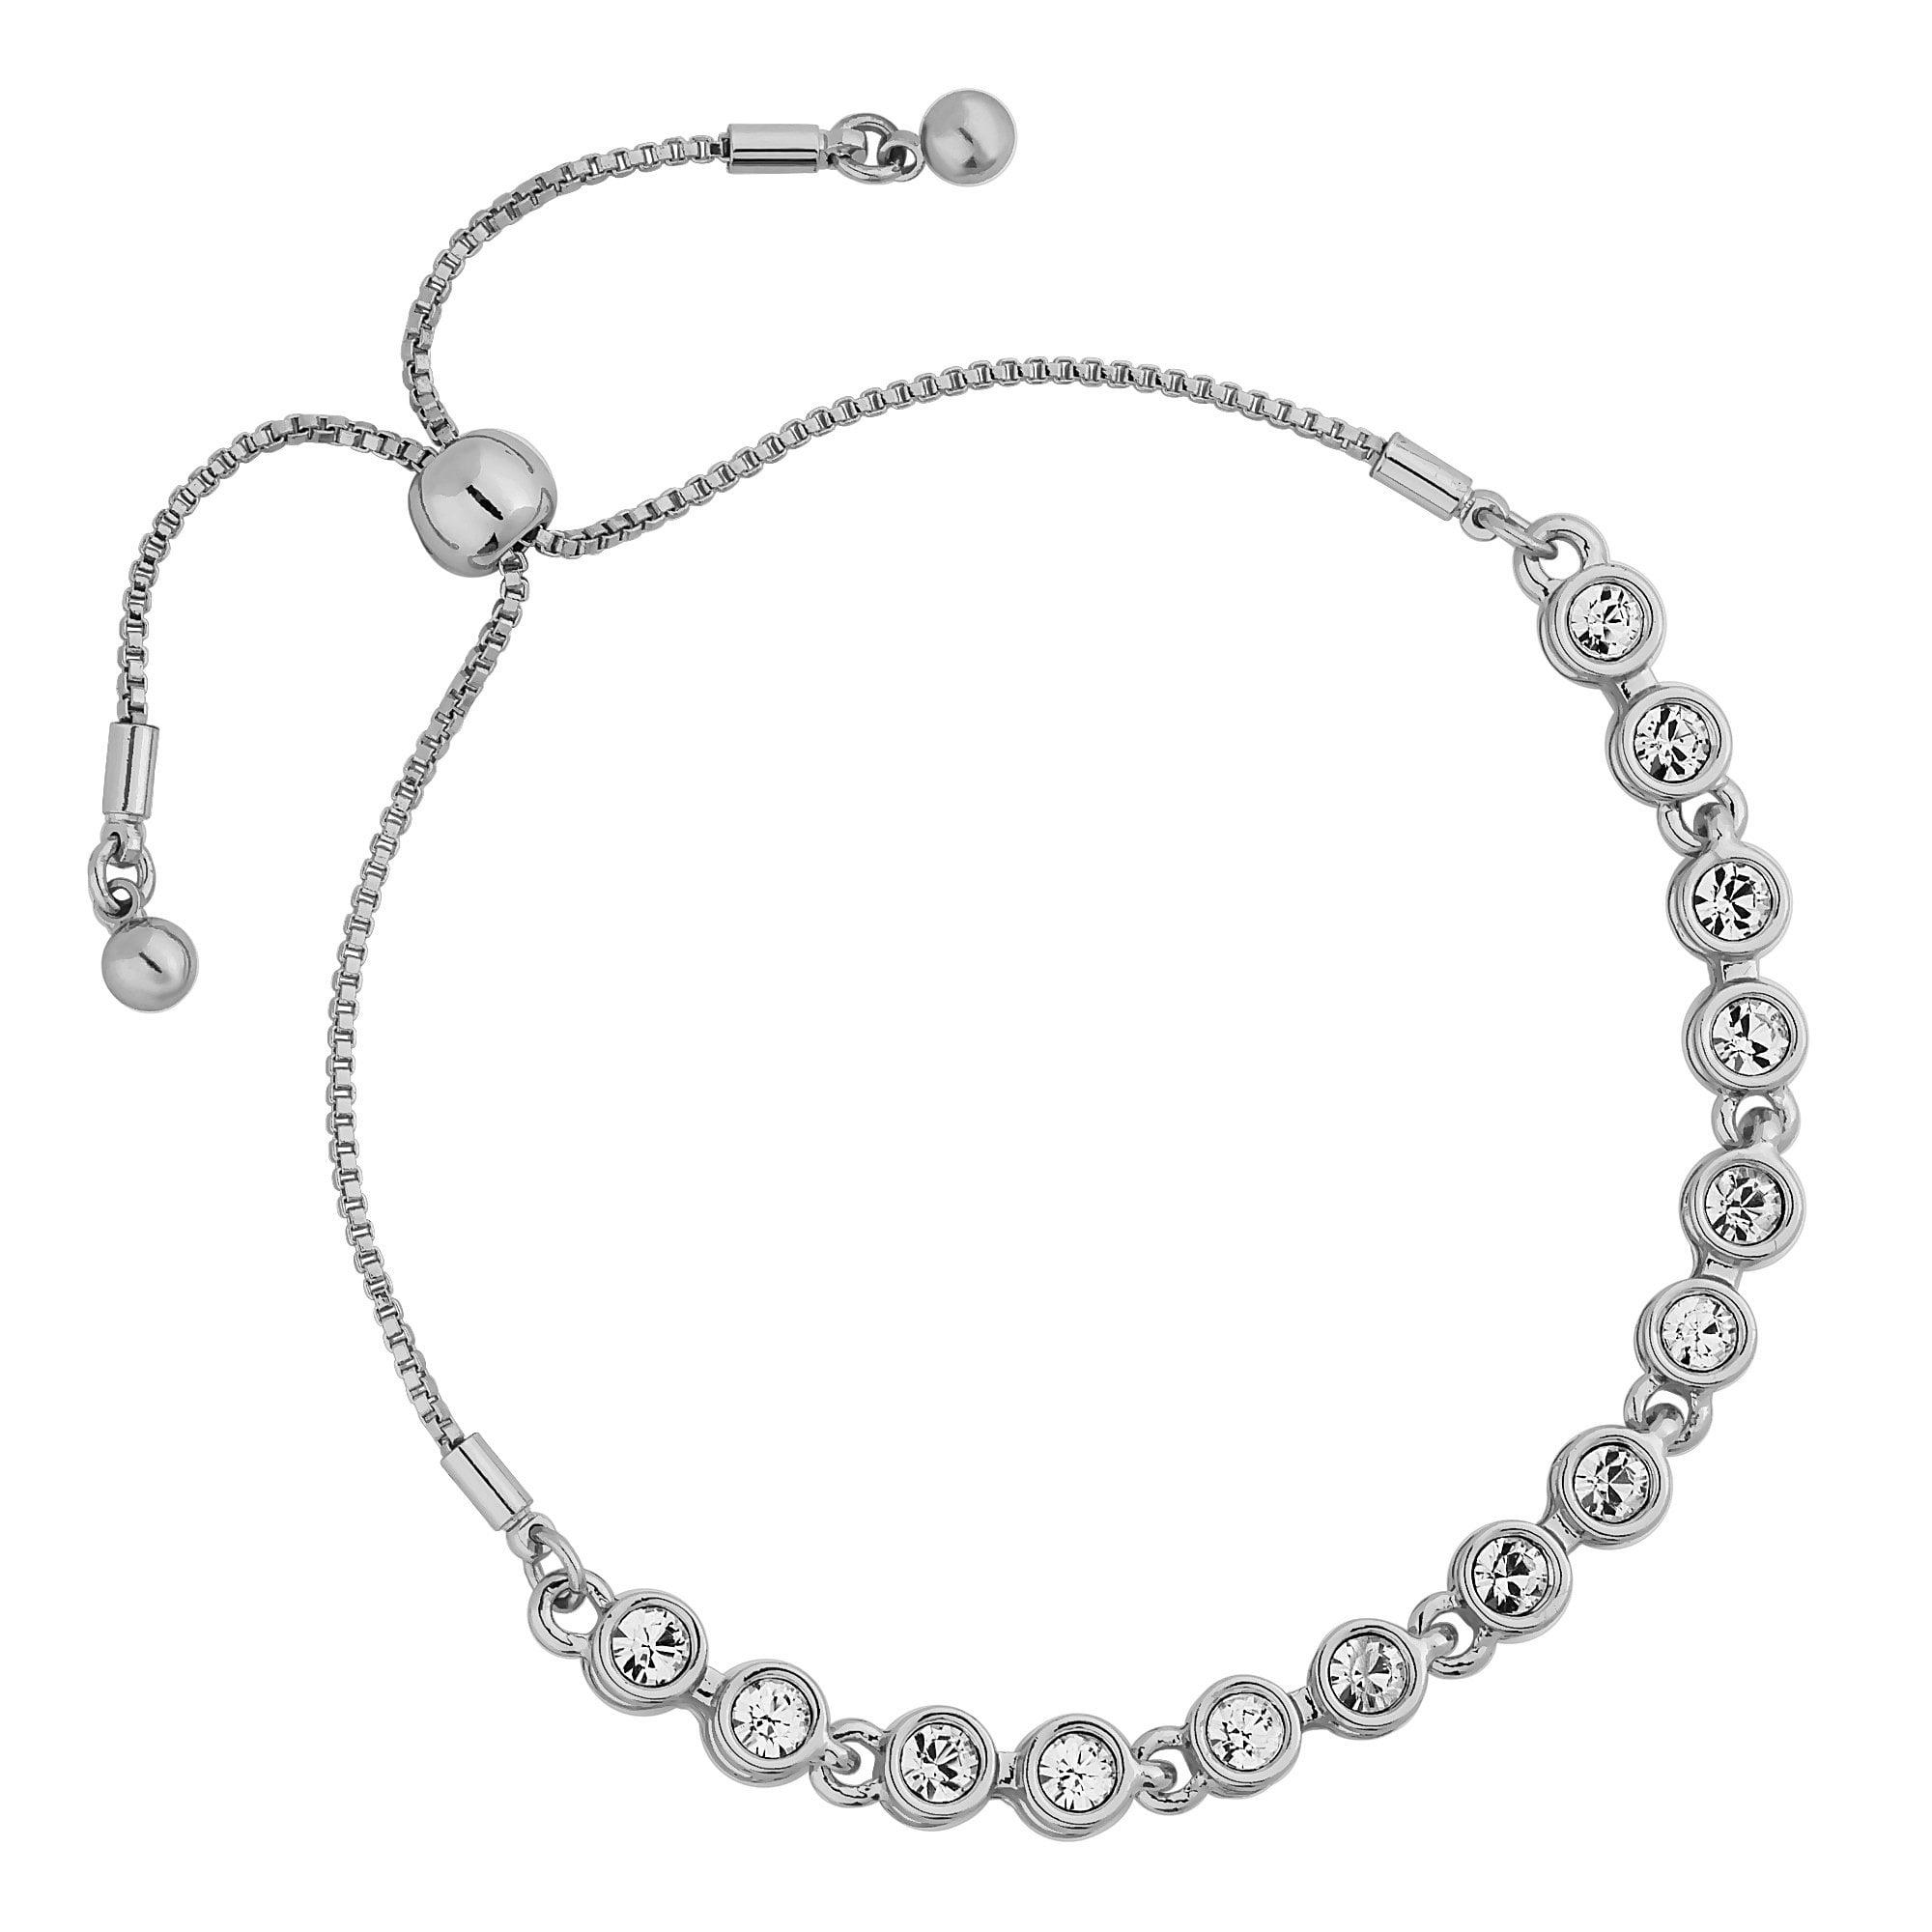 Jon Richard Made With Swarovski Crystals Silver Tennis Crystal Toggle Bracelet Embellished